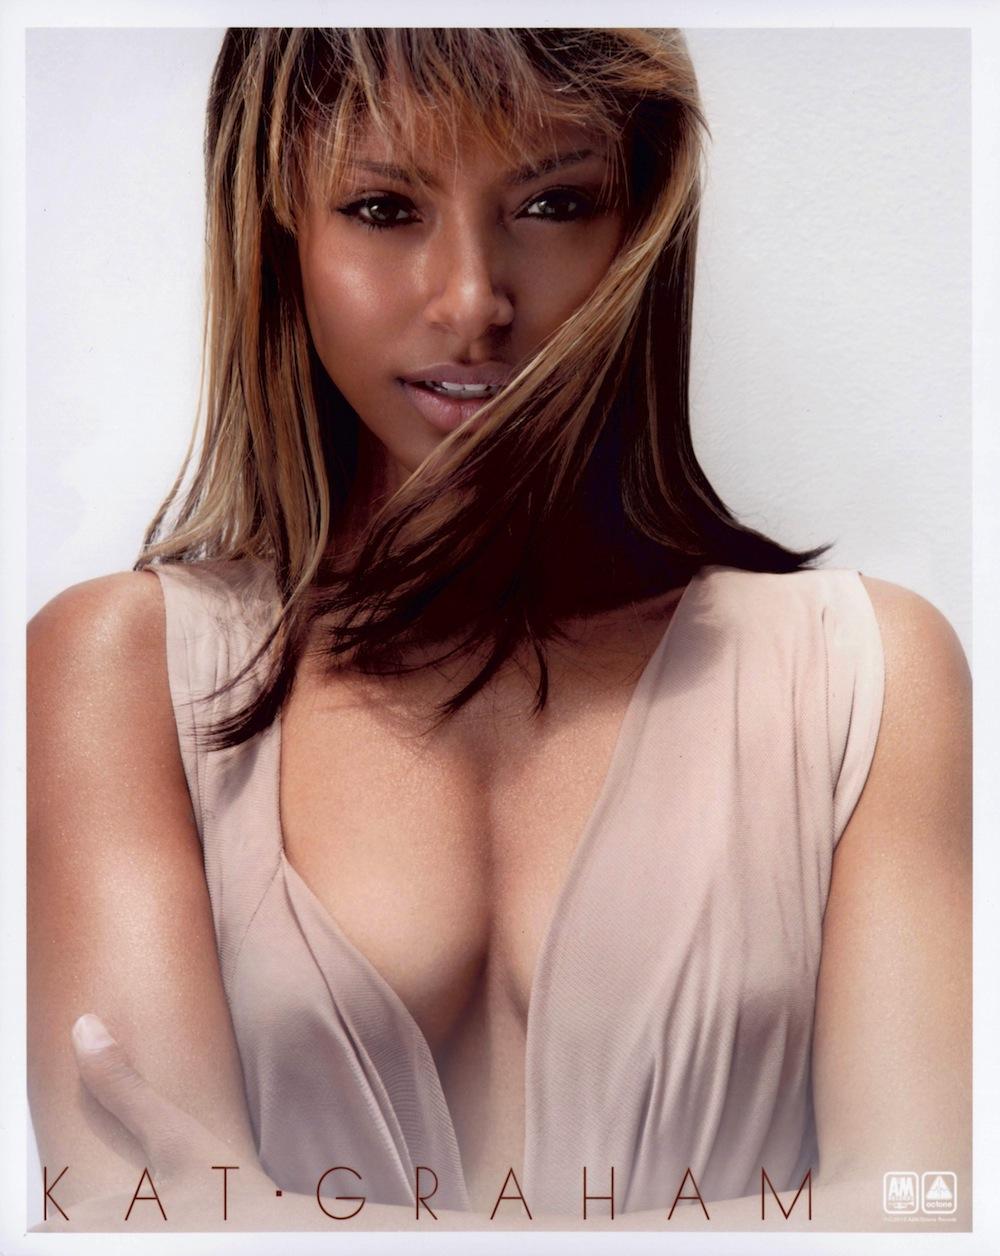 Katerina graham nude photos commit error